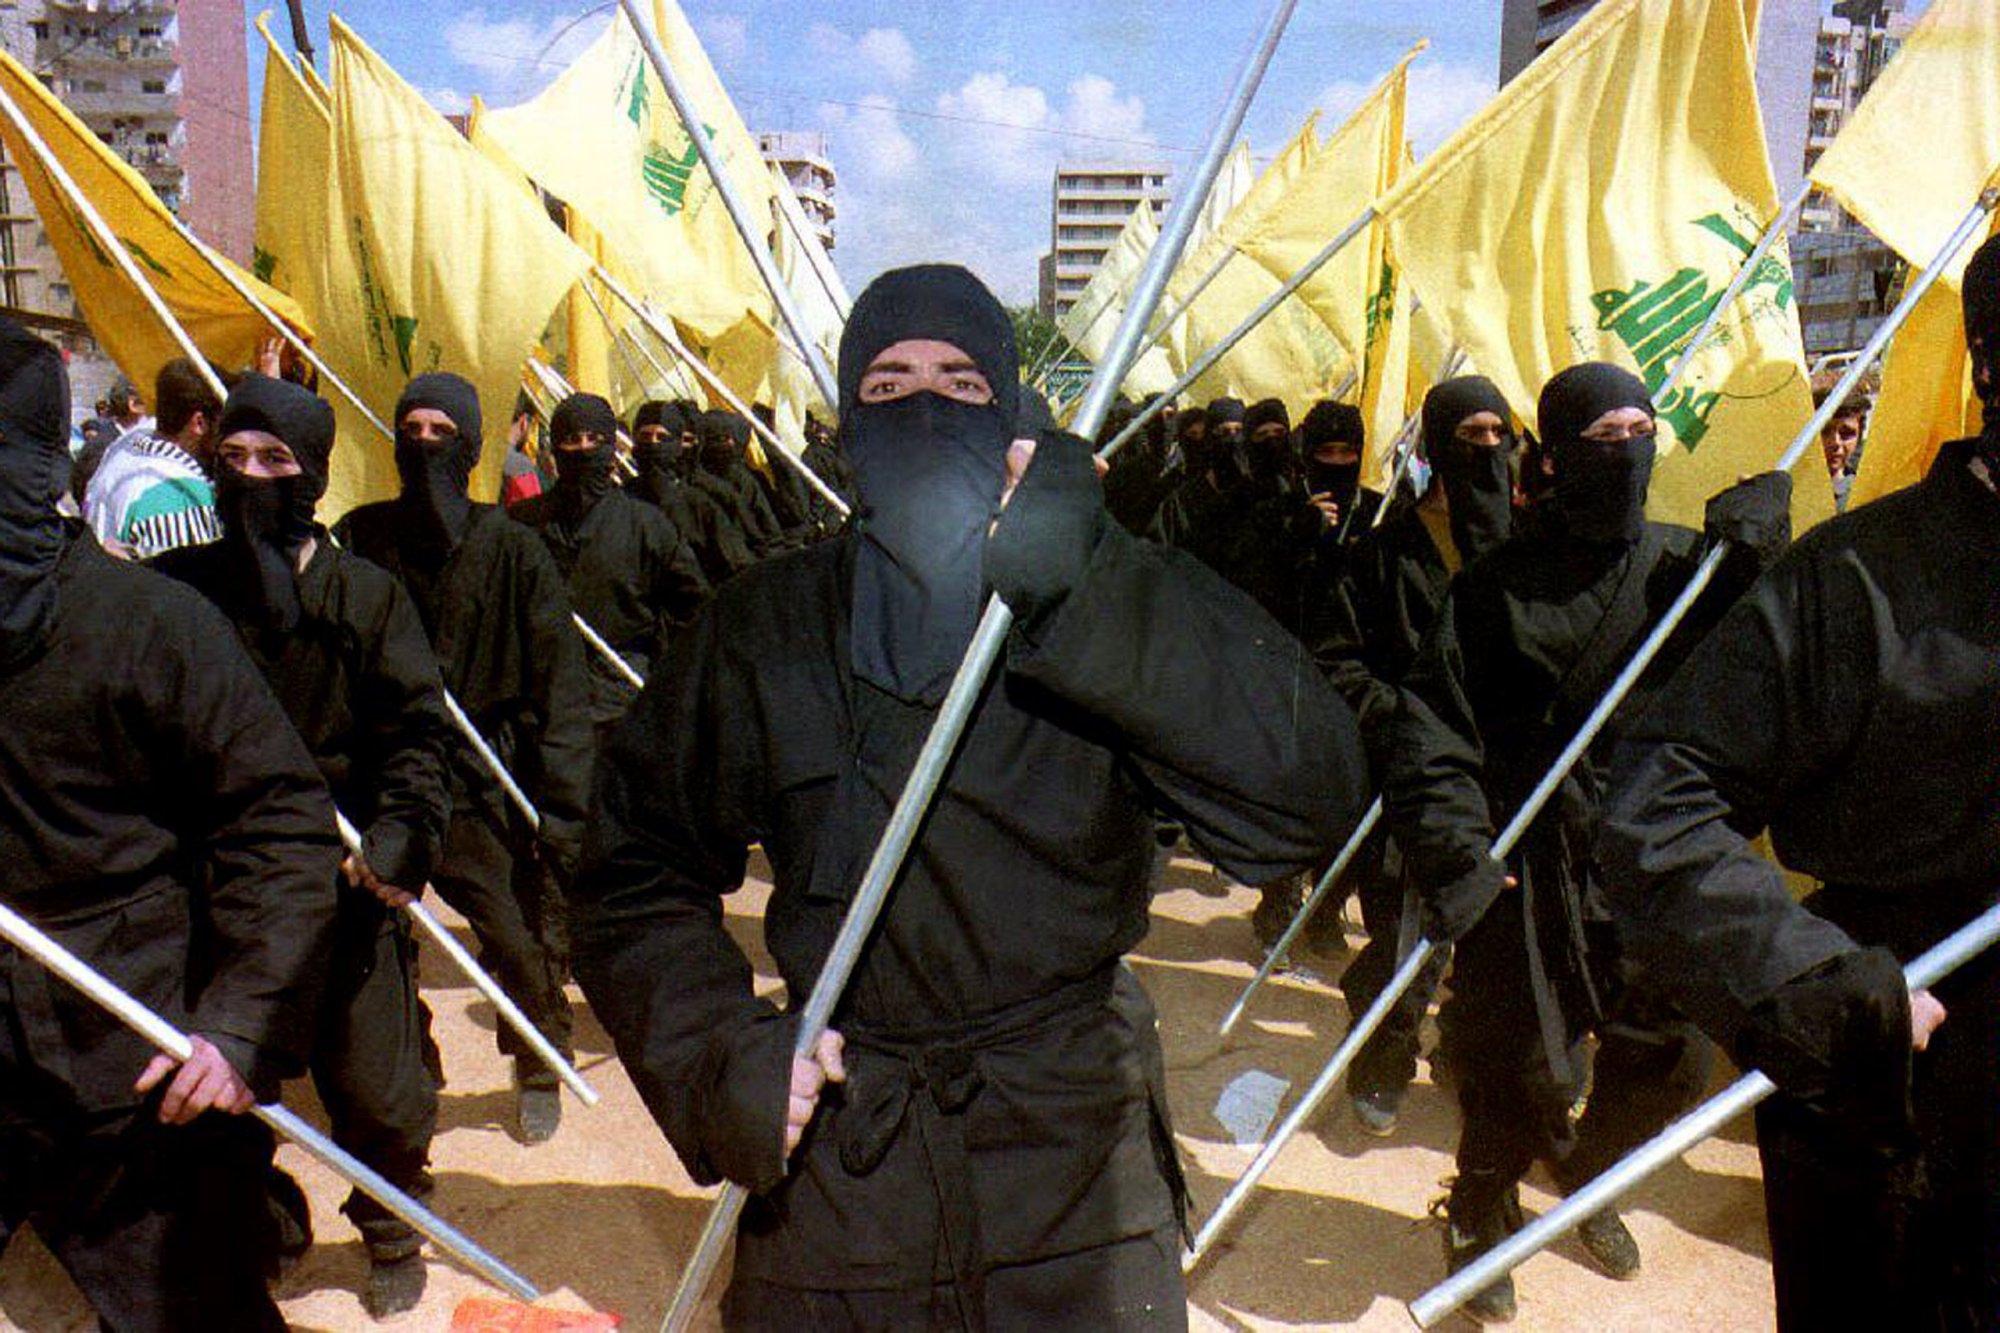 Iran: Those who declare Hezbollah terrorist aim to intimidate